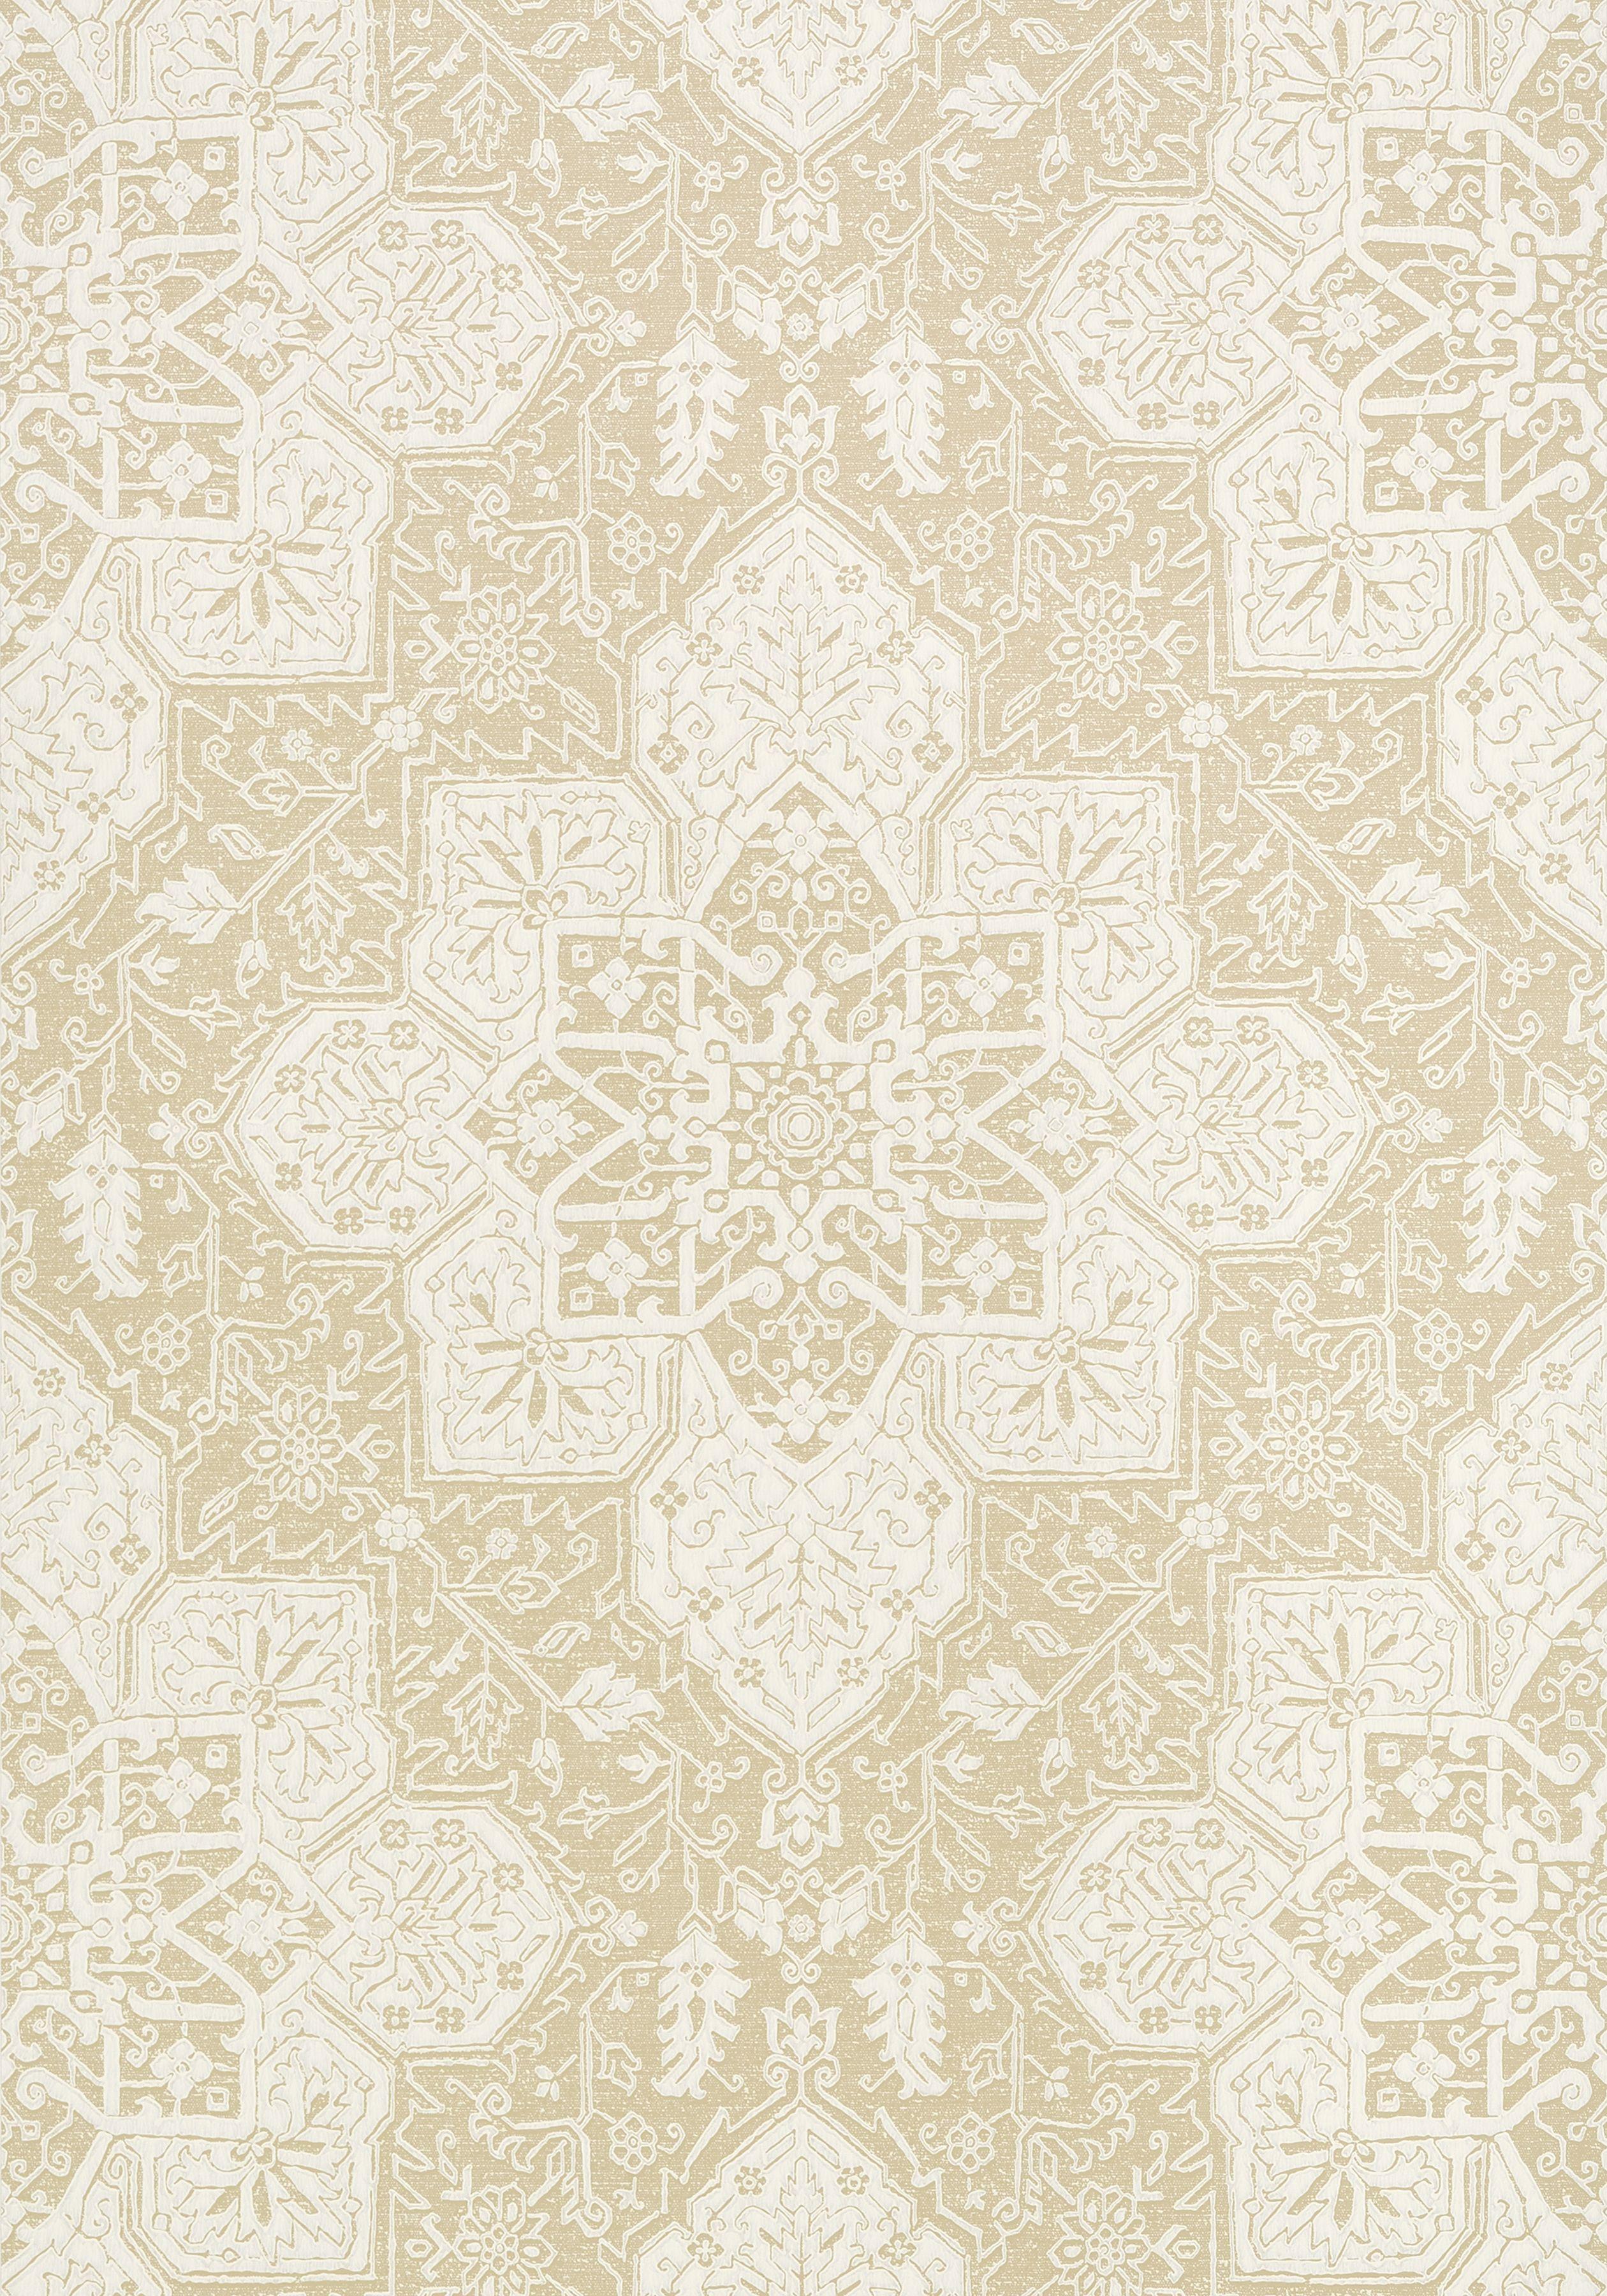 Bathroom Tile Wallpaper Tarragon Beige T64123 Collection Caravan From Thibaut Looks